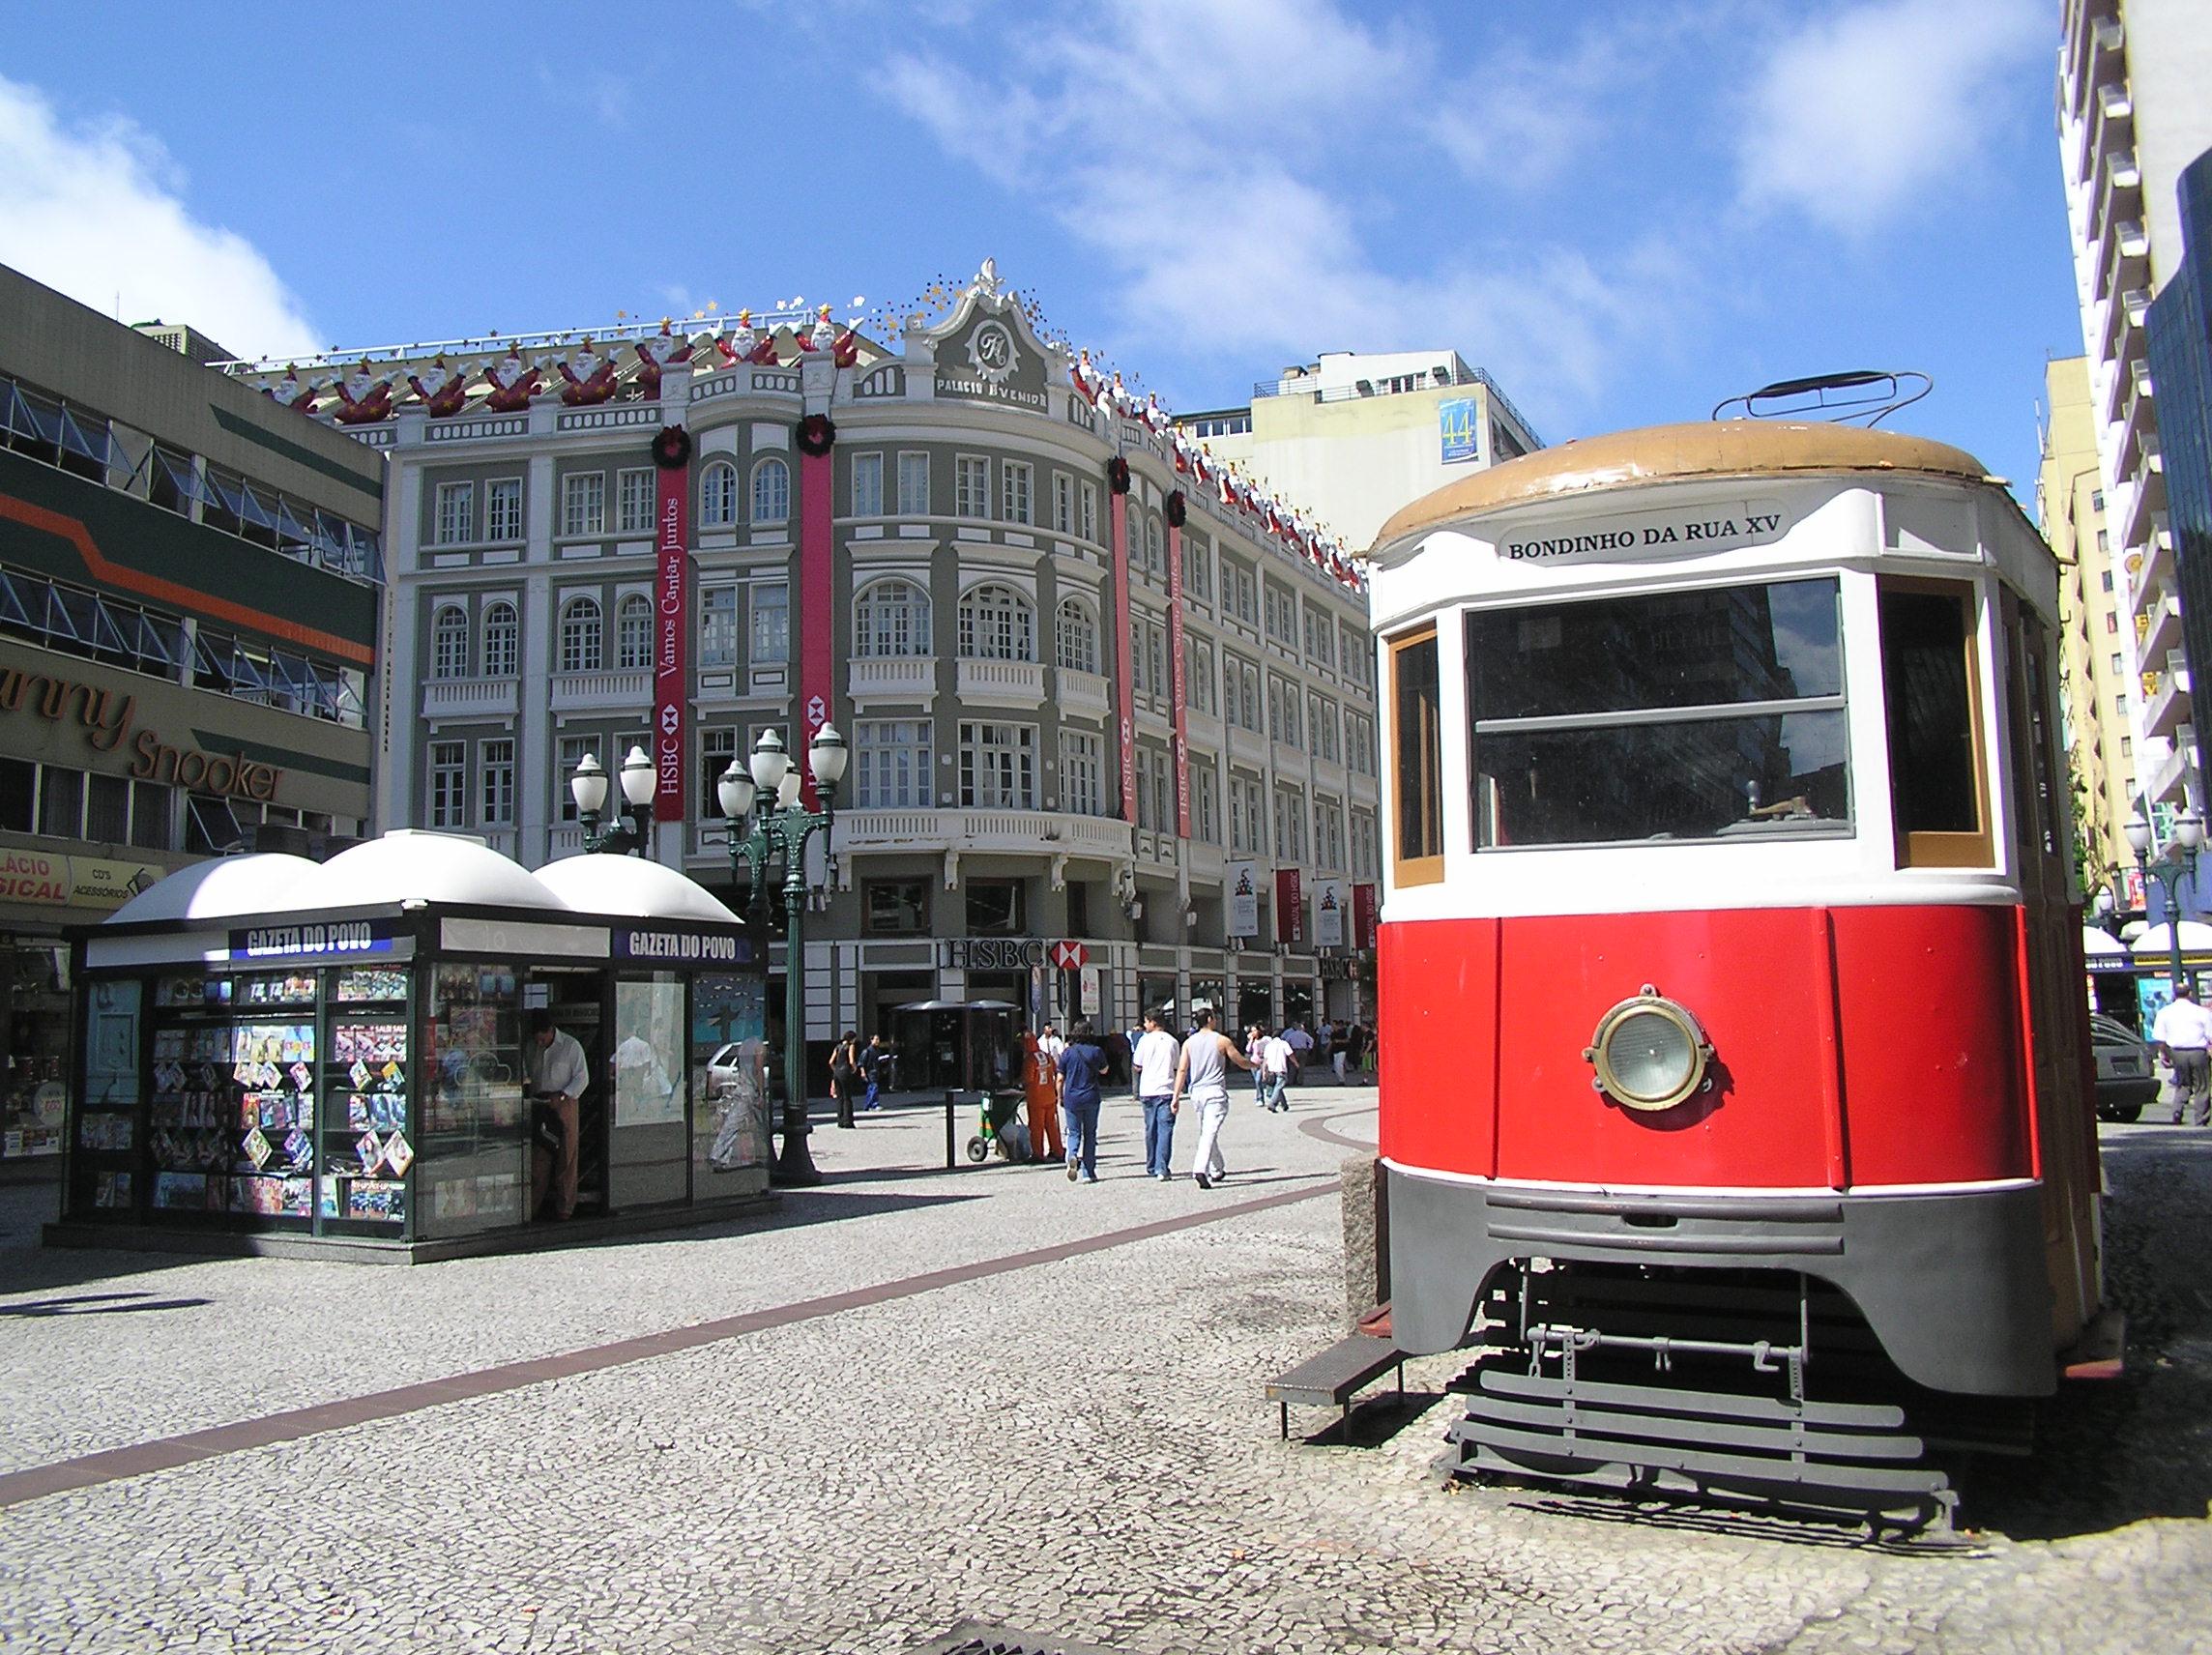 http://upload.wikimedia.org/wikipedia/commons/2/28/Palacio_Avenida_HSBC_3_curitiba_brasil.jpg